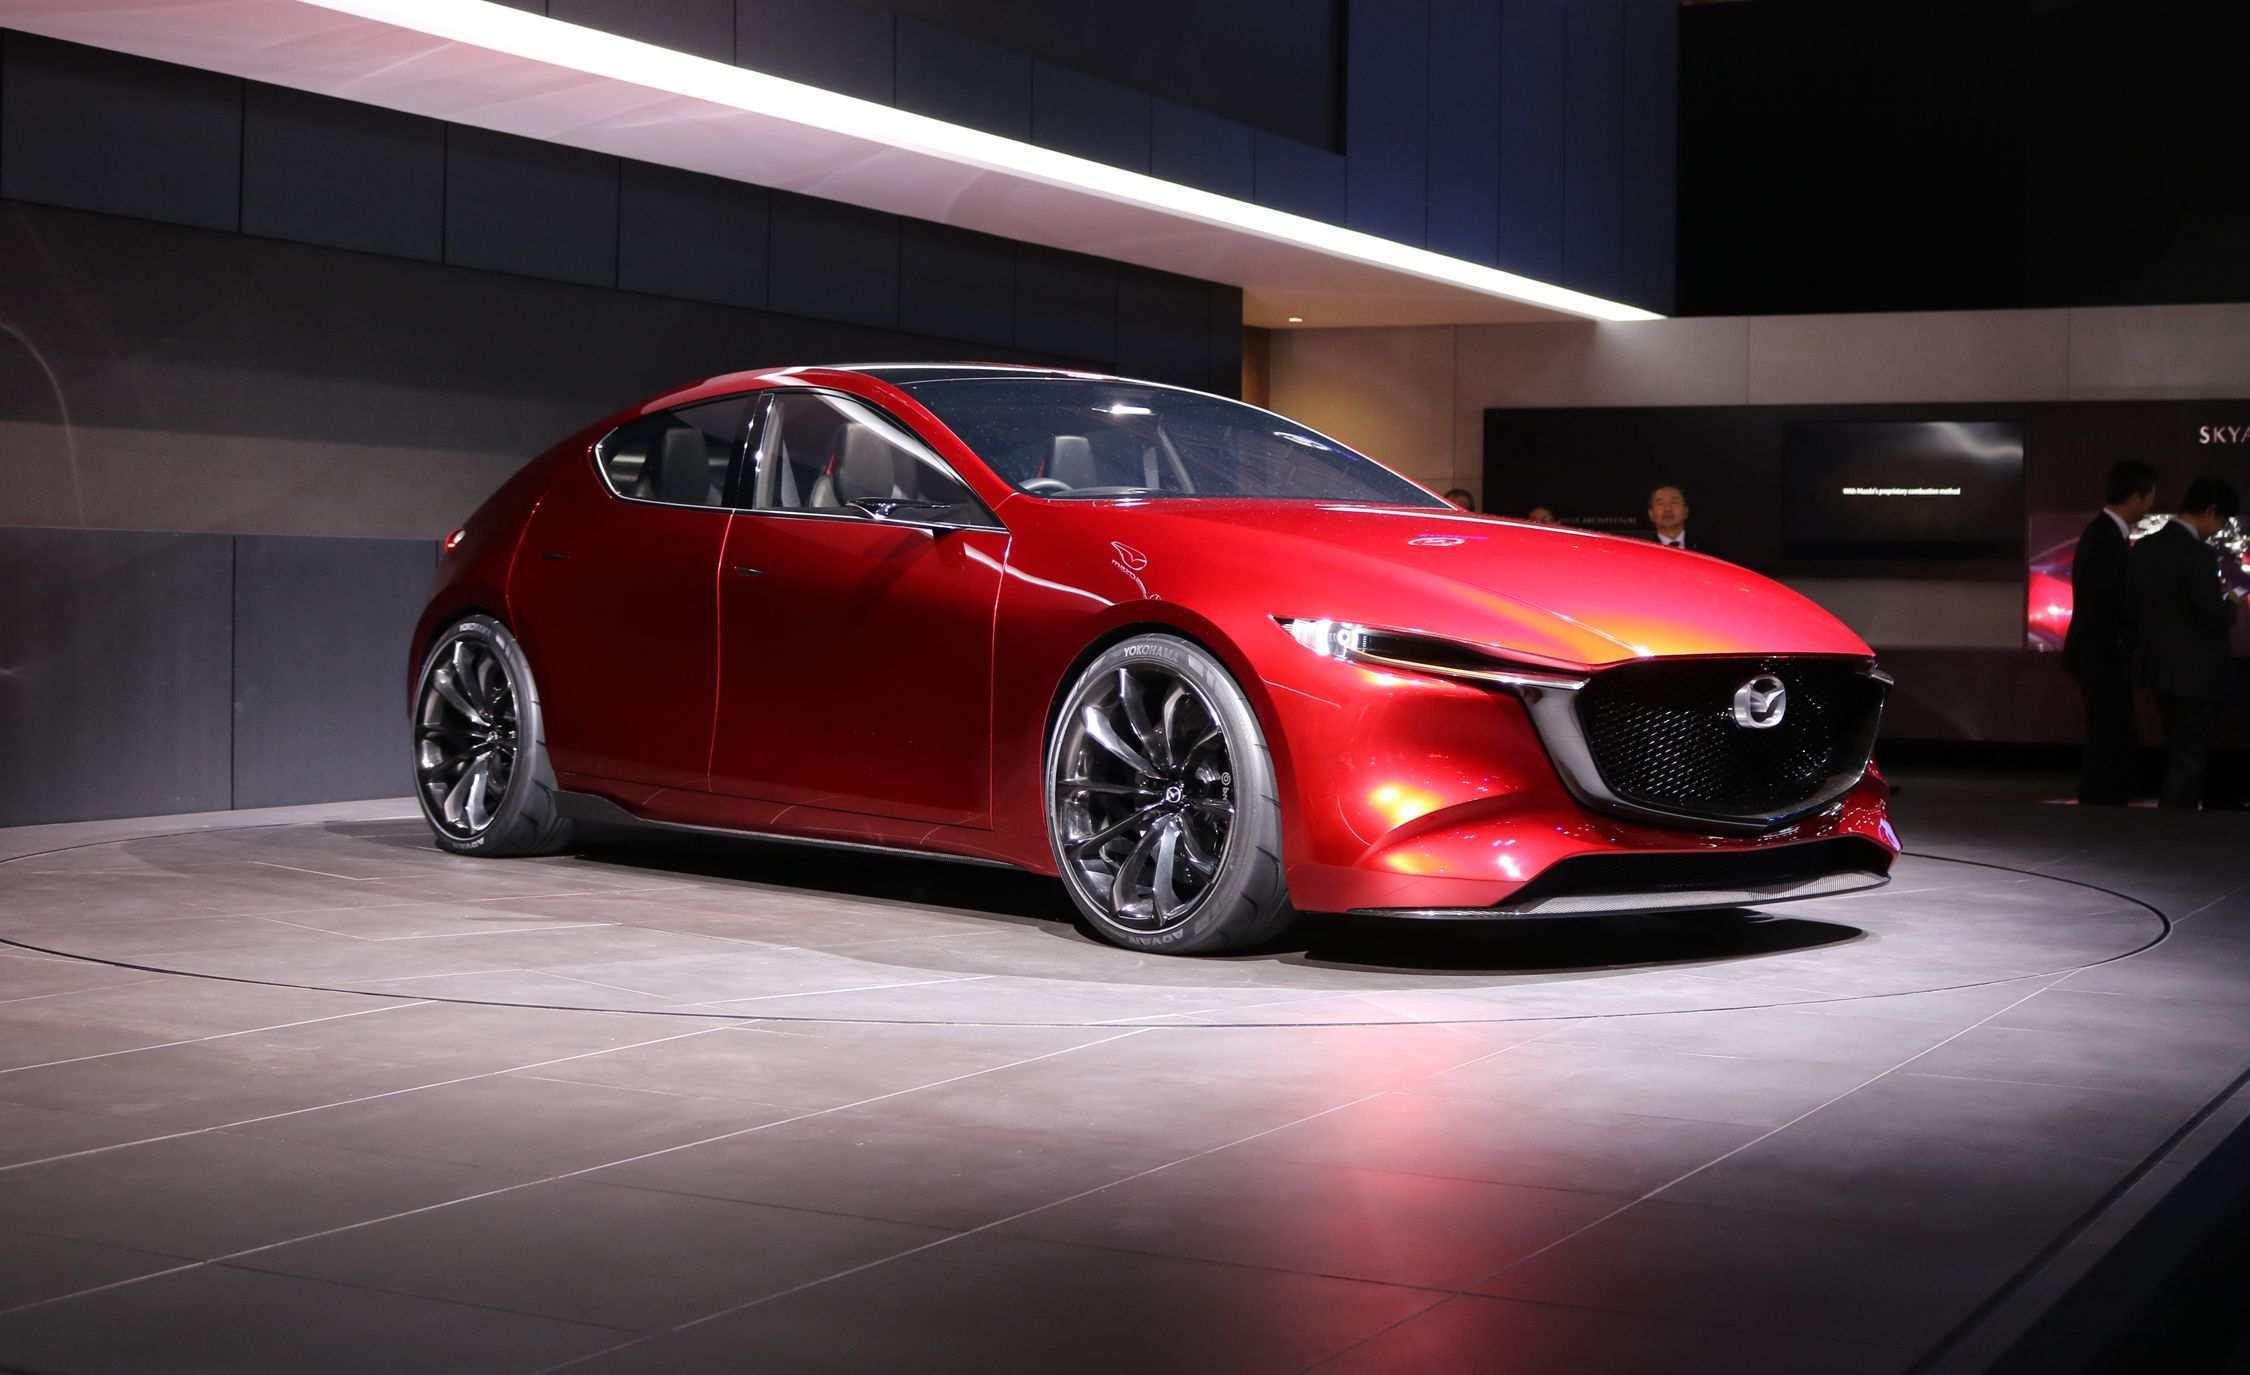 26 Concept of Mazda Kai 2020 Precio Price and Review by Mazda Kai 2020 Precio